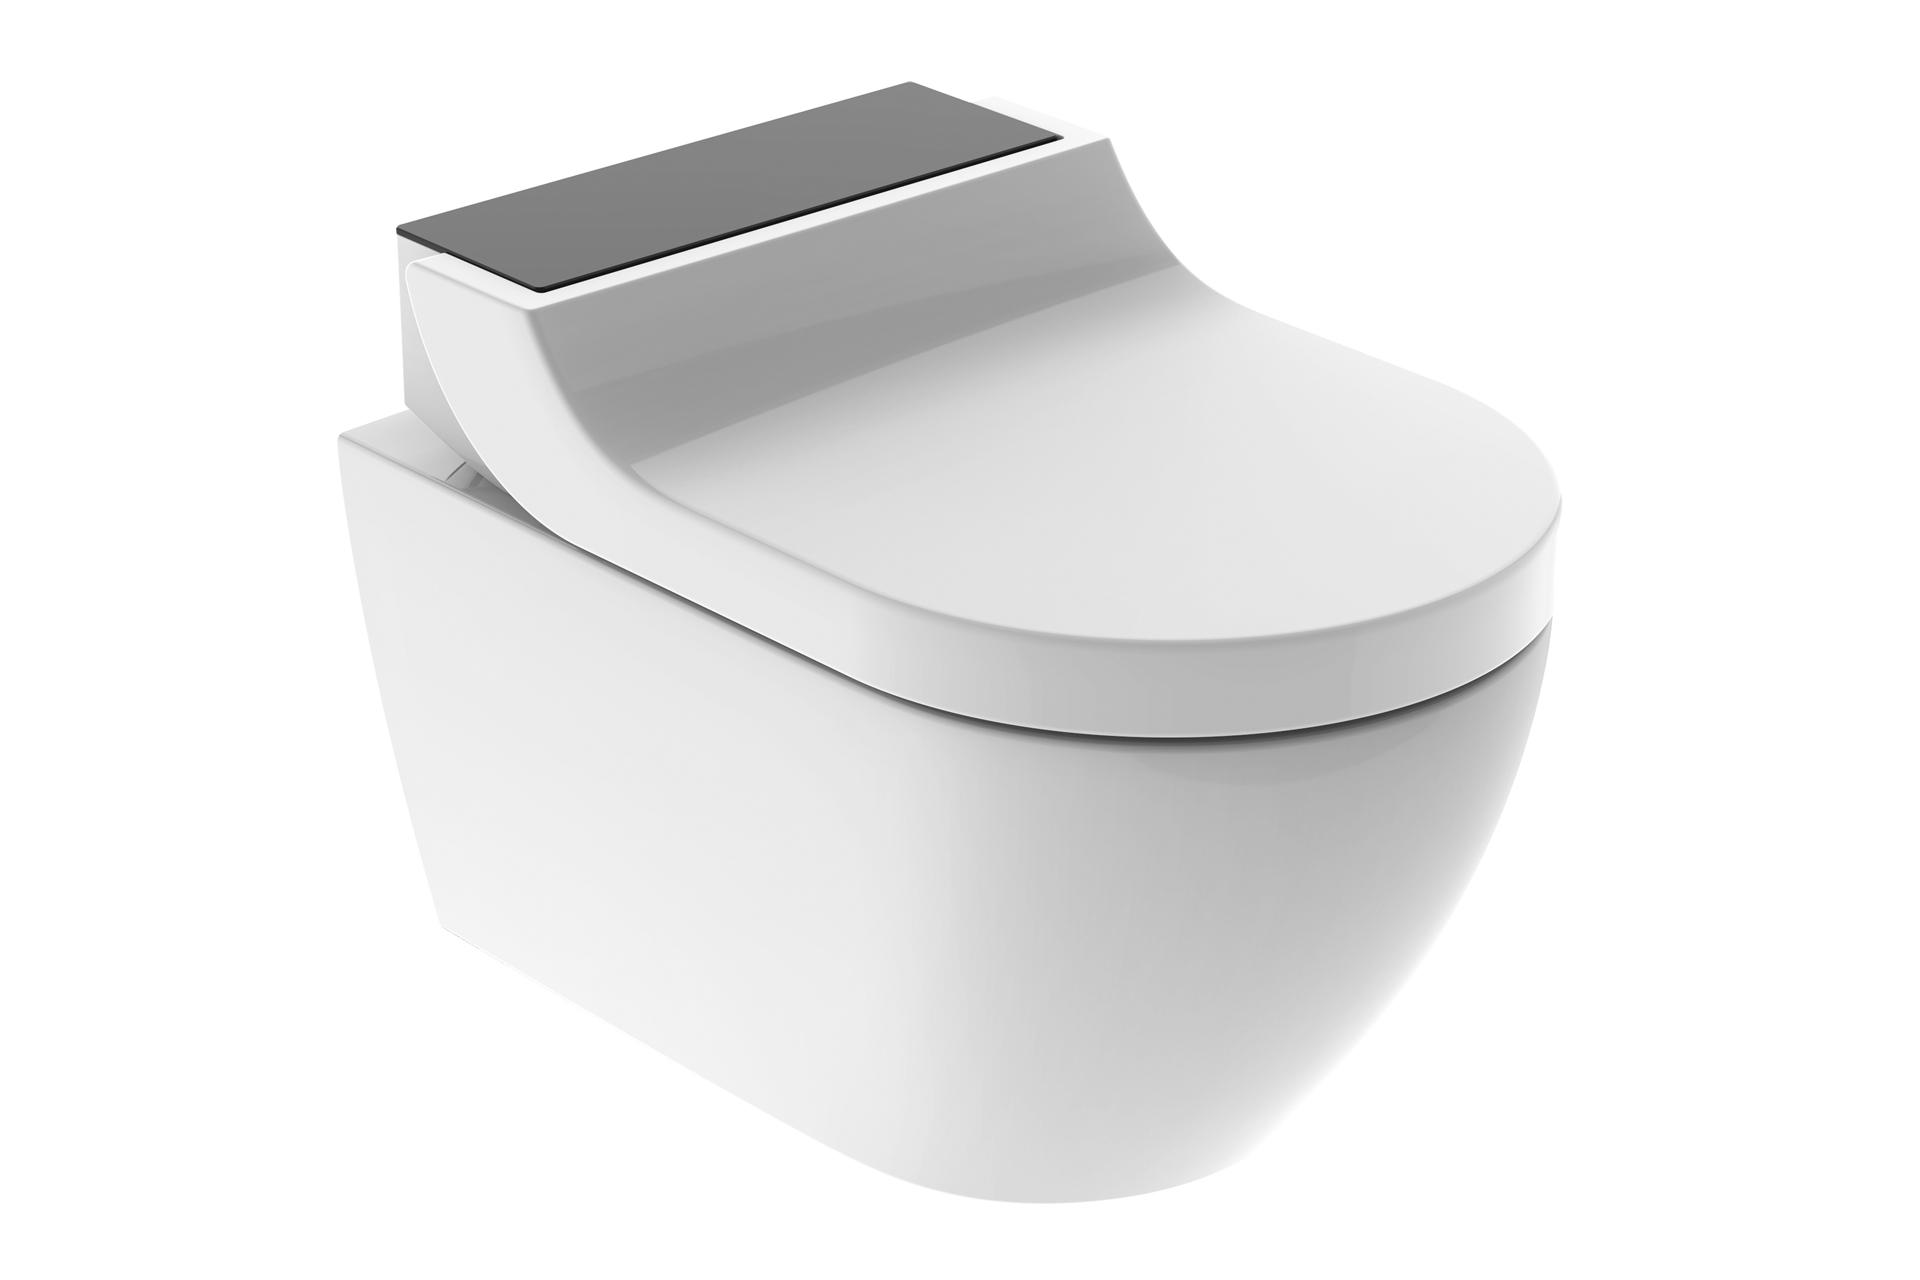 Full Size of Dusch Wc Geberit Aquaclean Aufstze Wohltuende Duschfunktion Einfache Bette Duschwanne Hüppe Duschen Fliesen Dusche Bluetooth Lautsprecher Pendeltür Dusche Dusch Wc